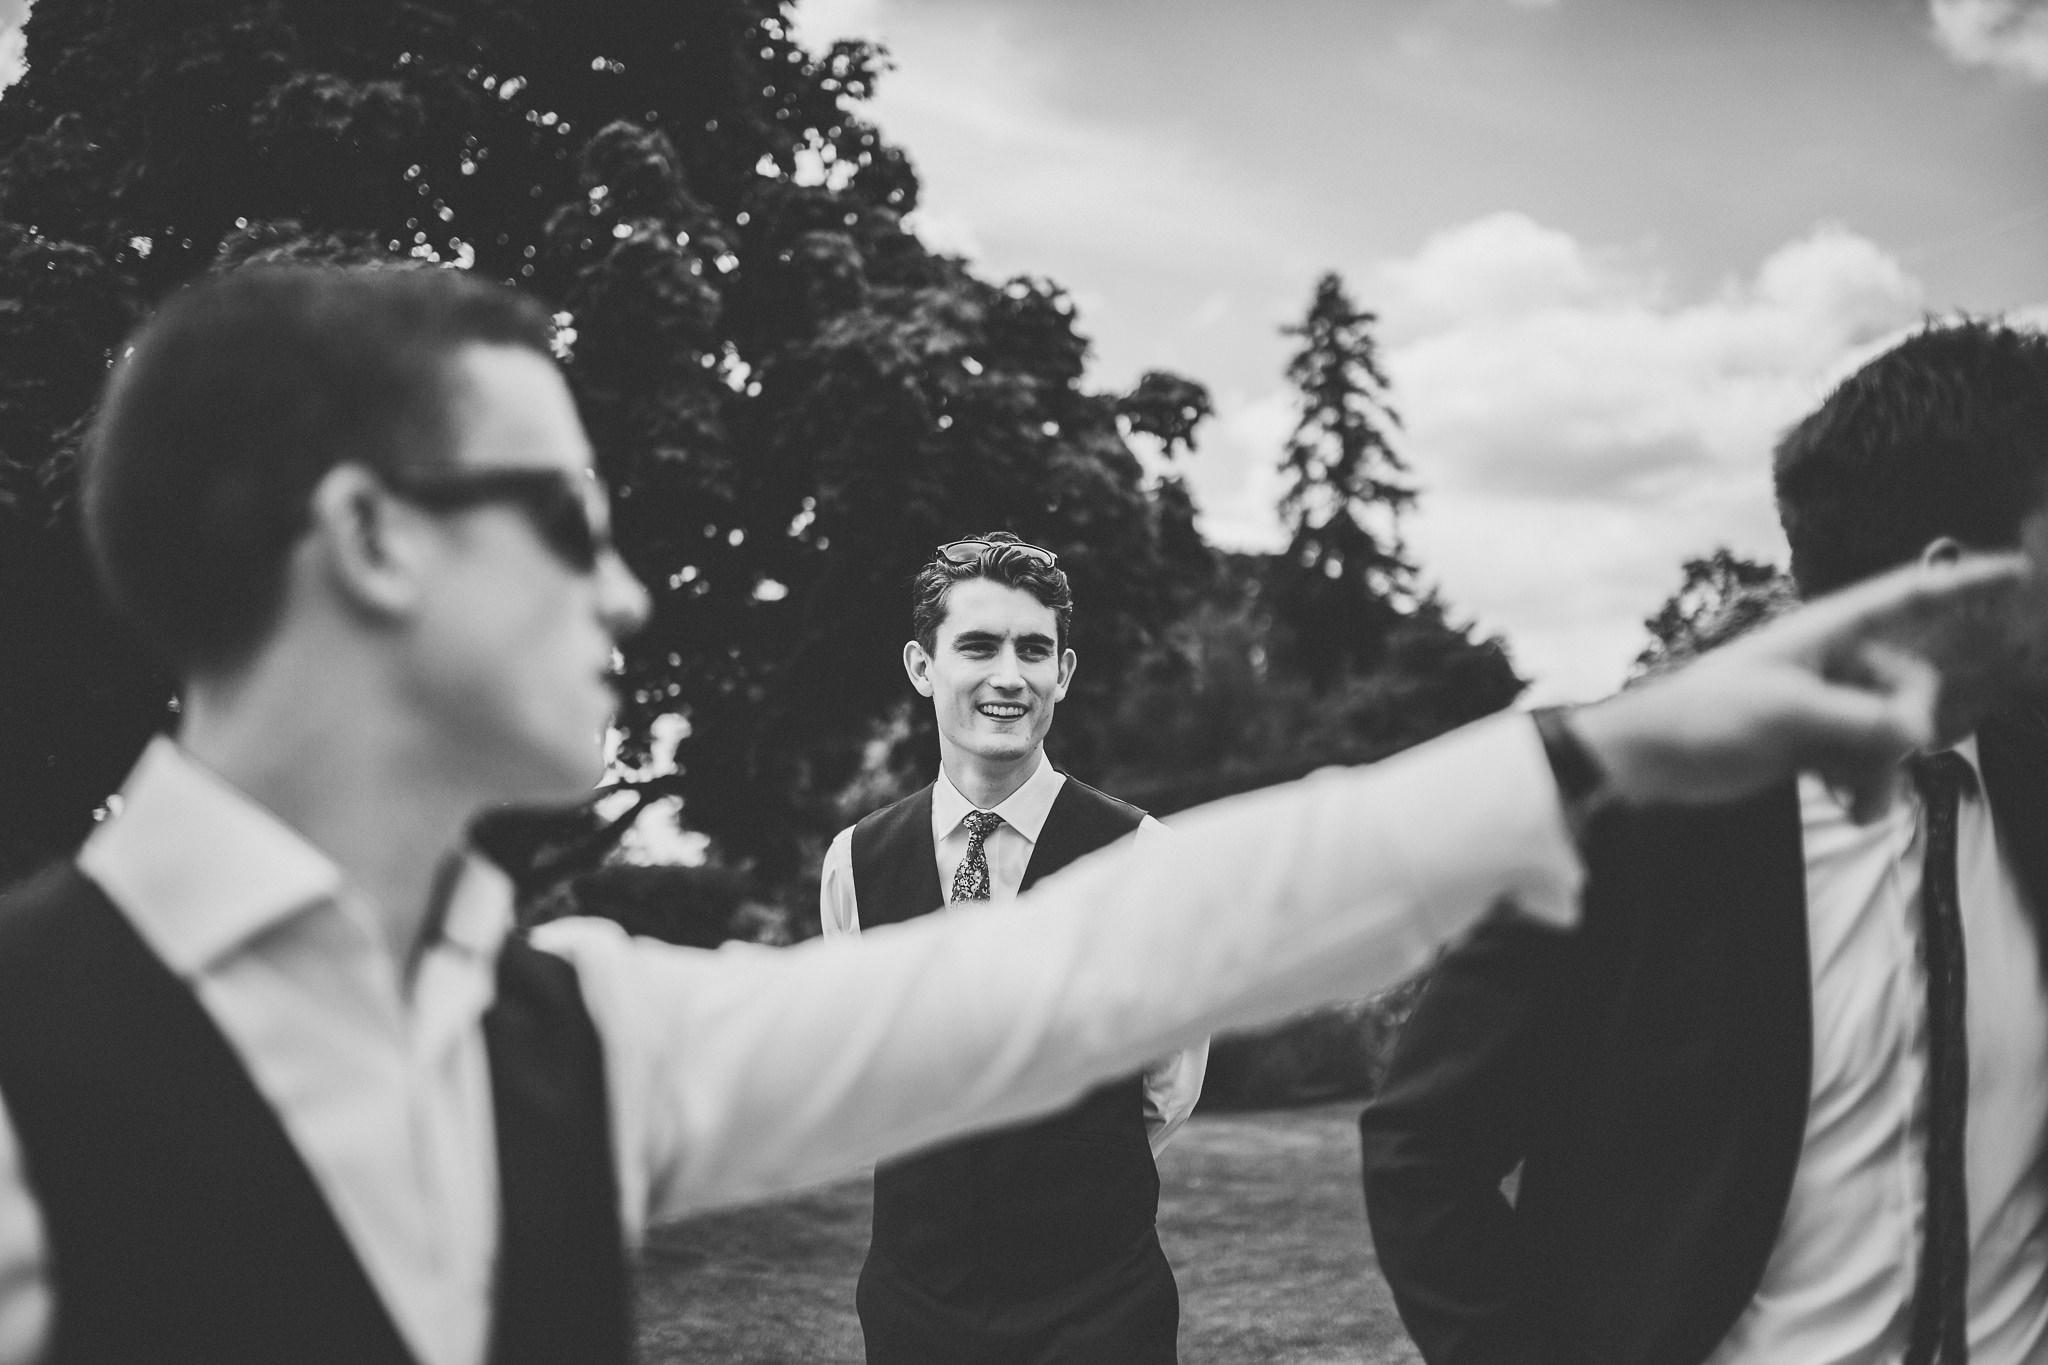 paul-marbrook-Gaynes-Park Wedding-Photographer-90006